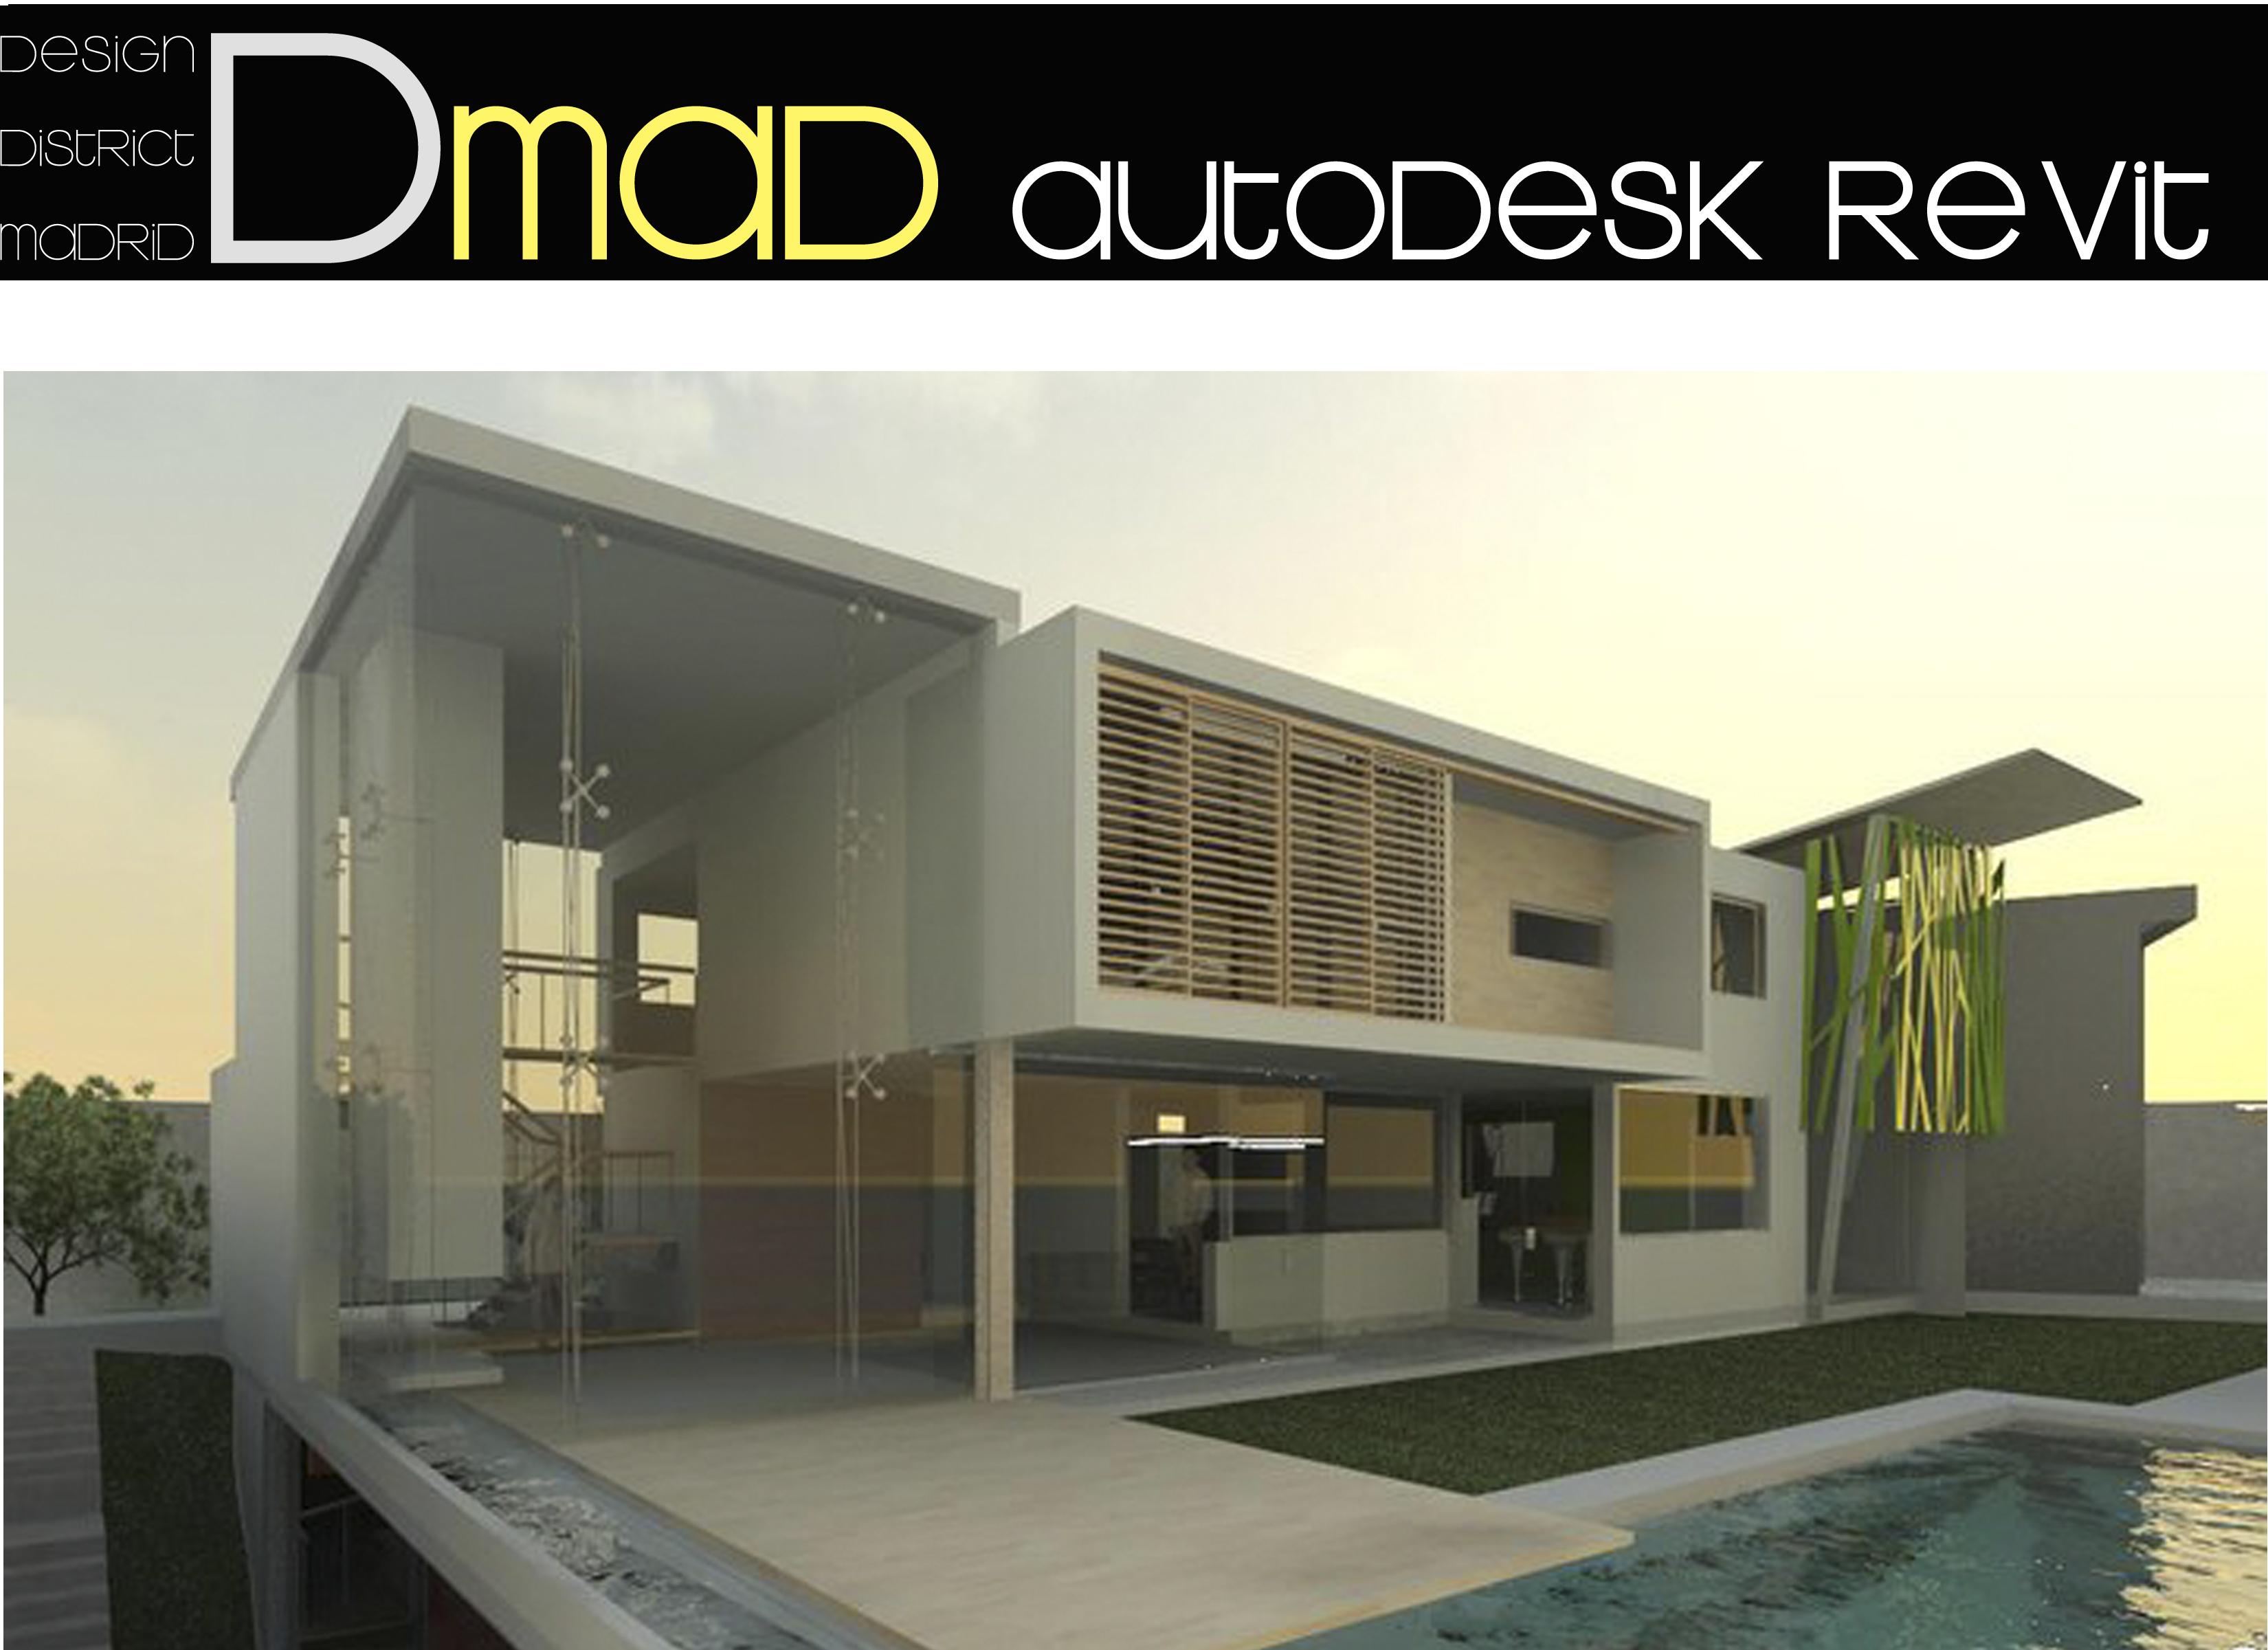 Dmad_Master Class Autodesk Revit